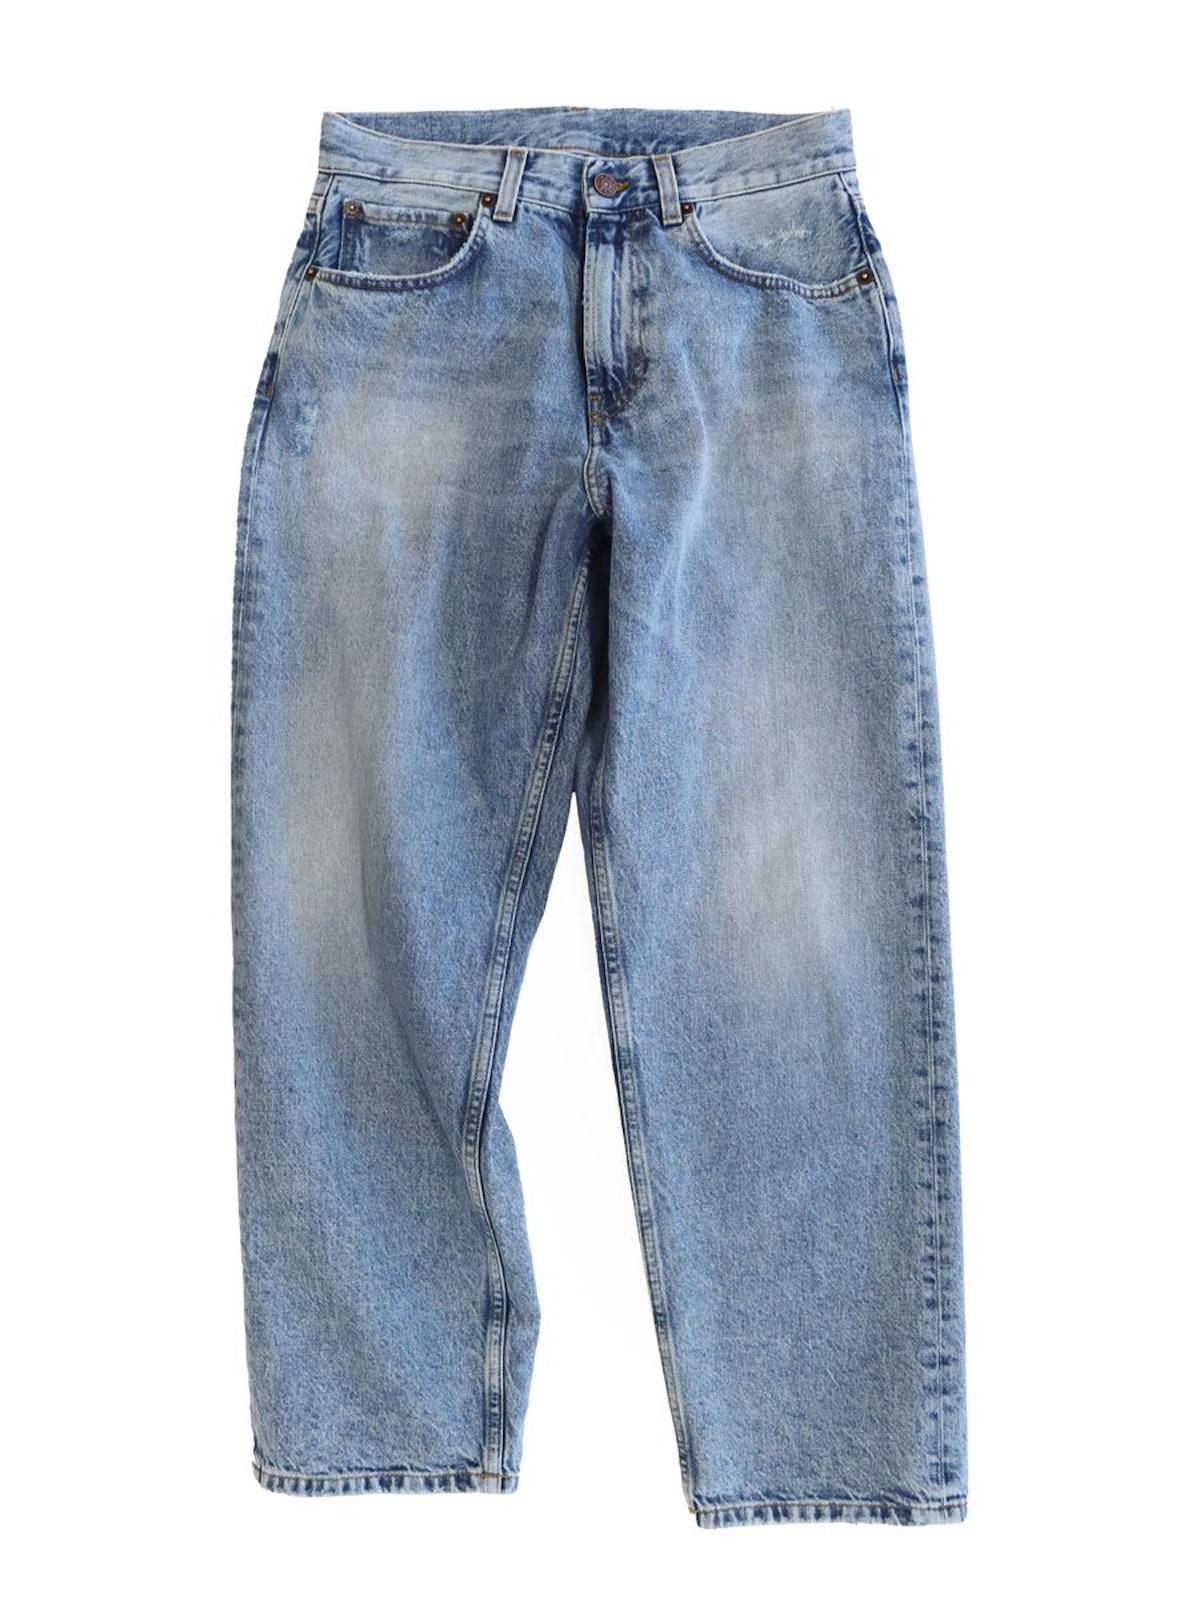 Skater Jean in Light Blue Wash